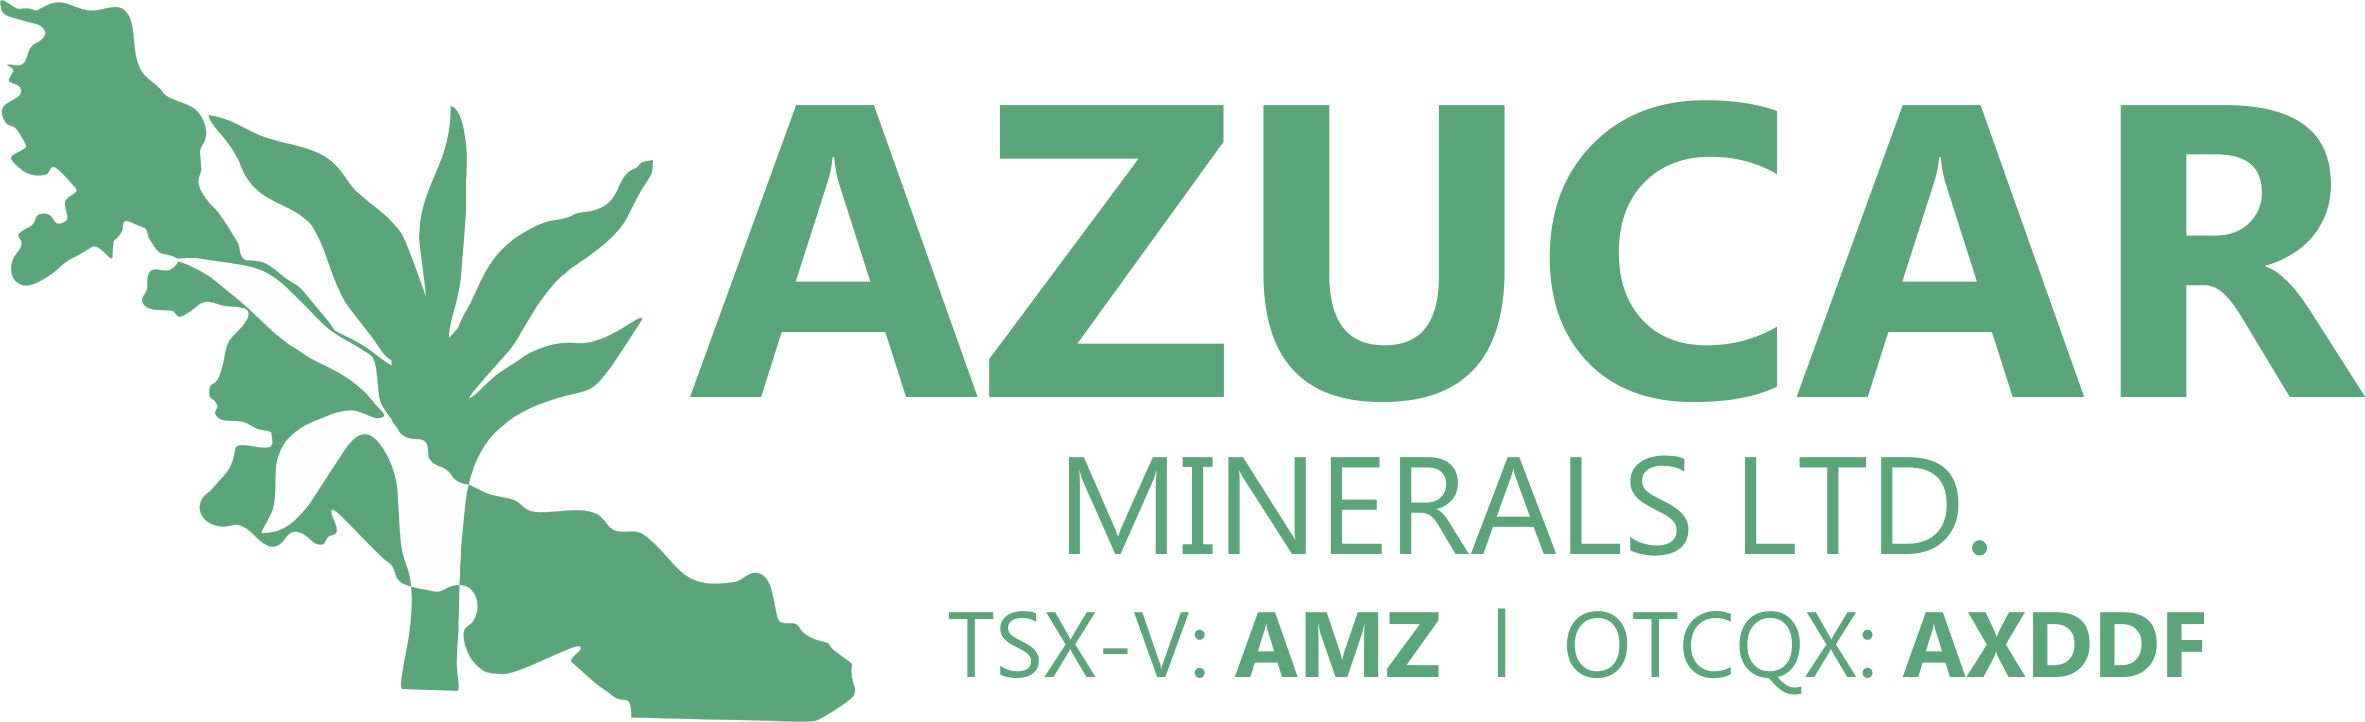 Azucar Updates on Drilling Activity at the El Cobre Project, Mexico